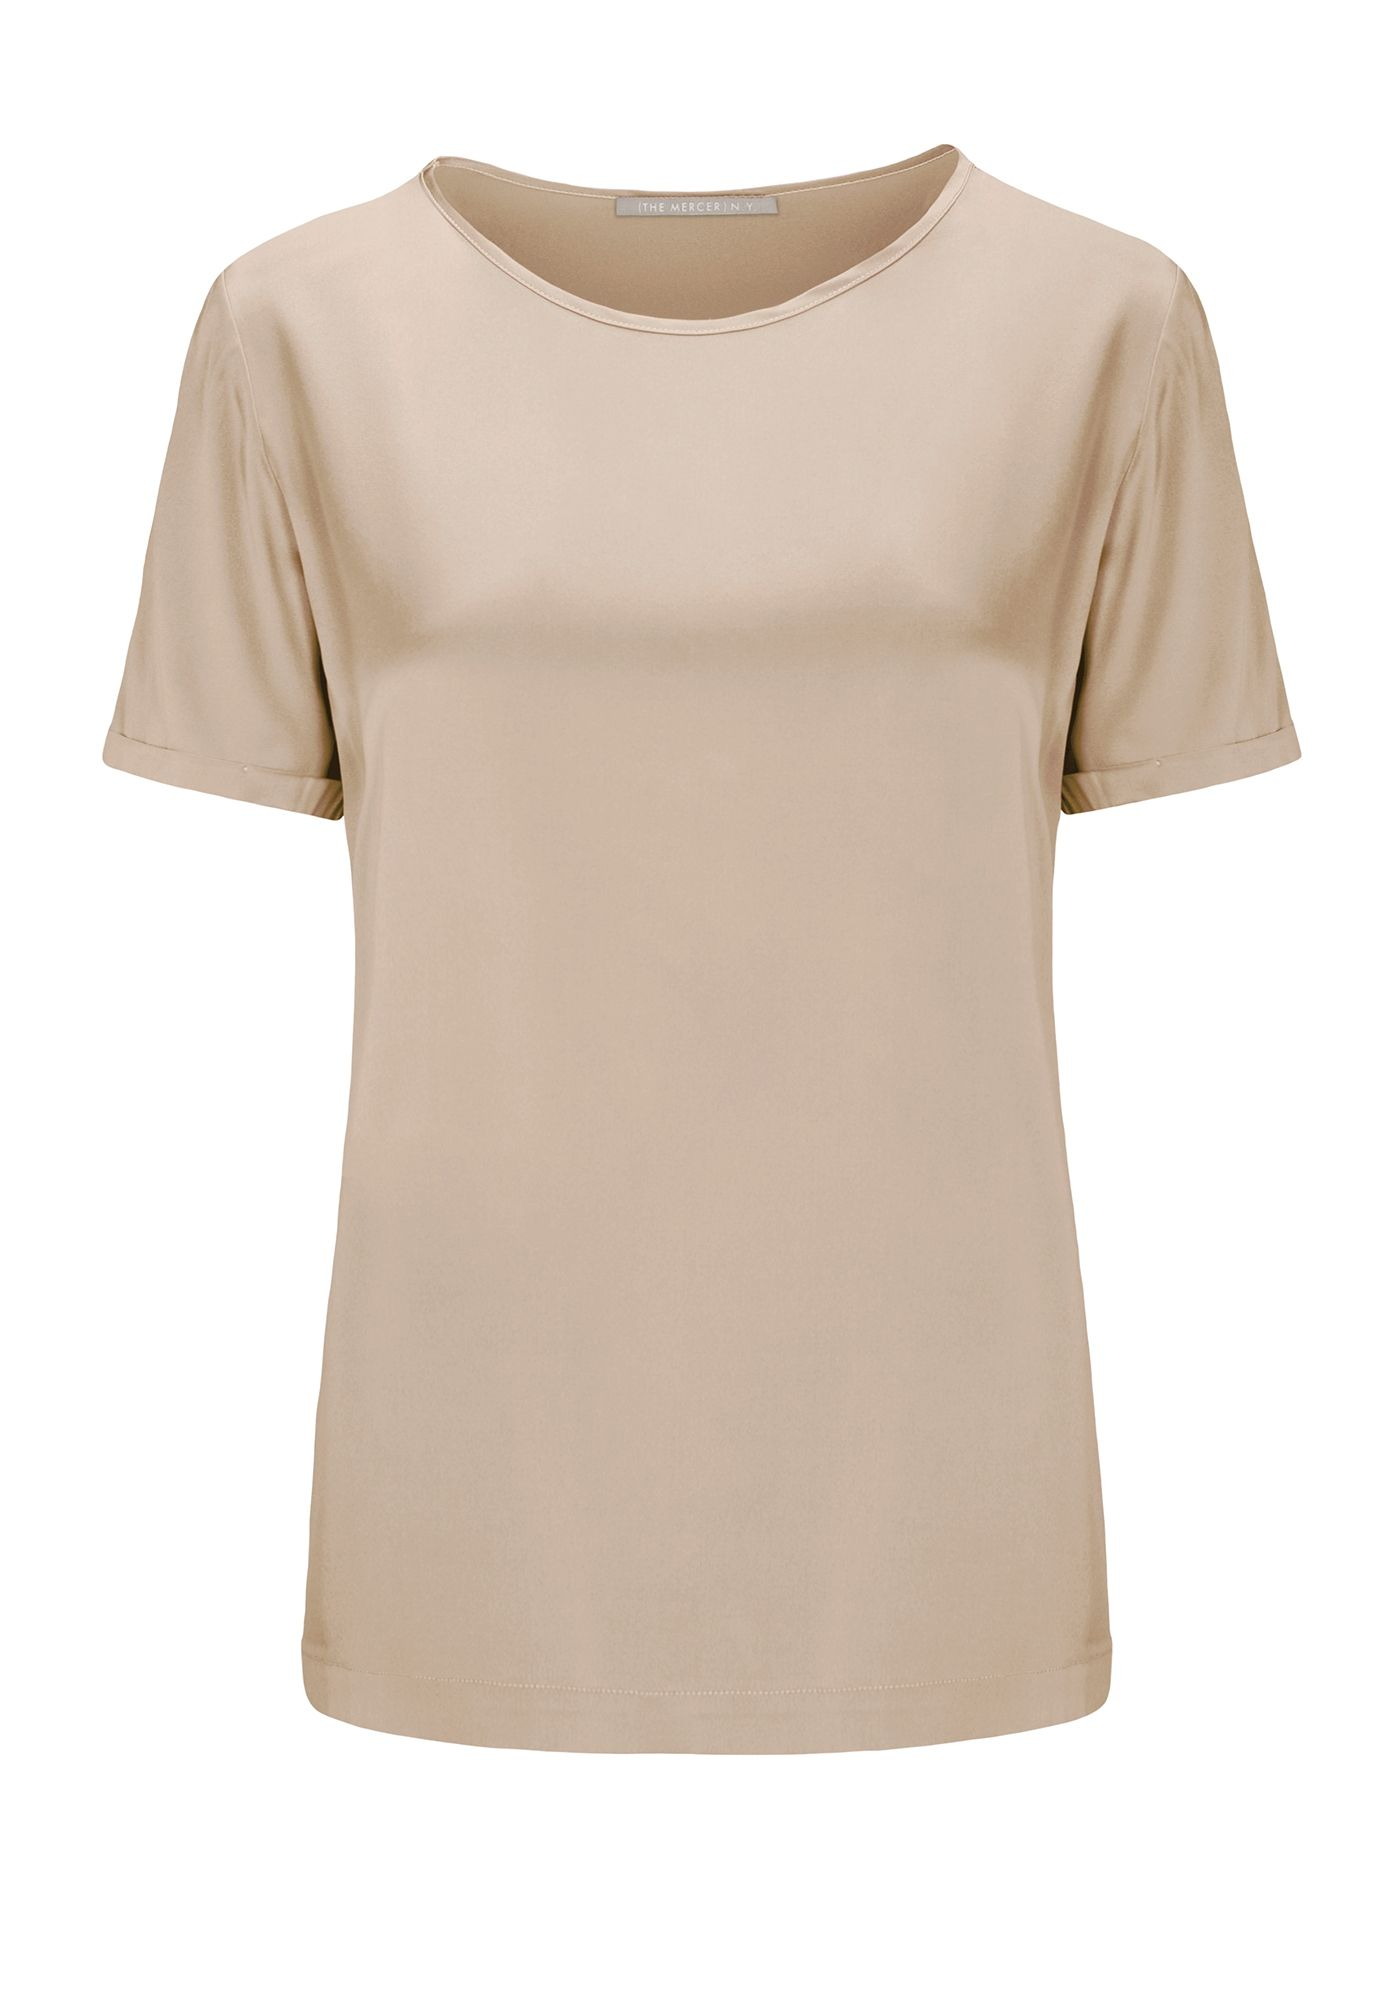 Satinsilk Shirt mit feinem Umschlag am Ärmelsaum - Taupe